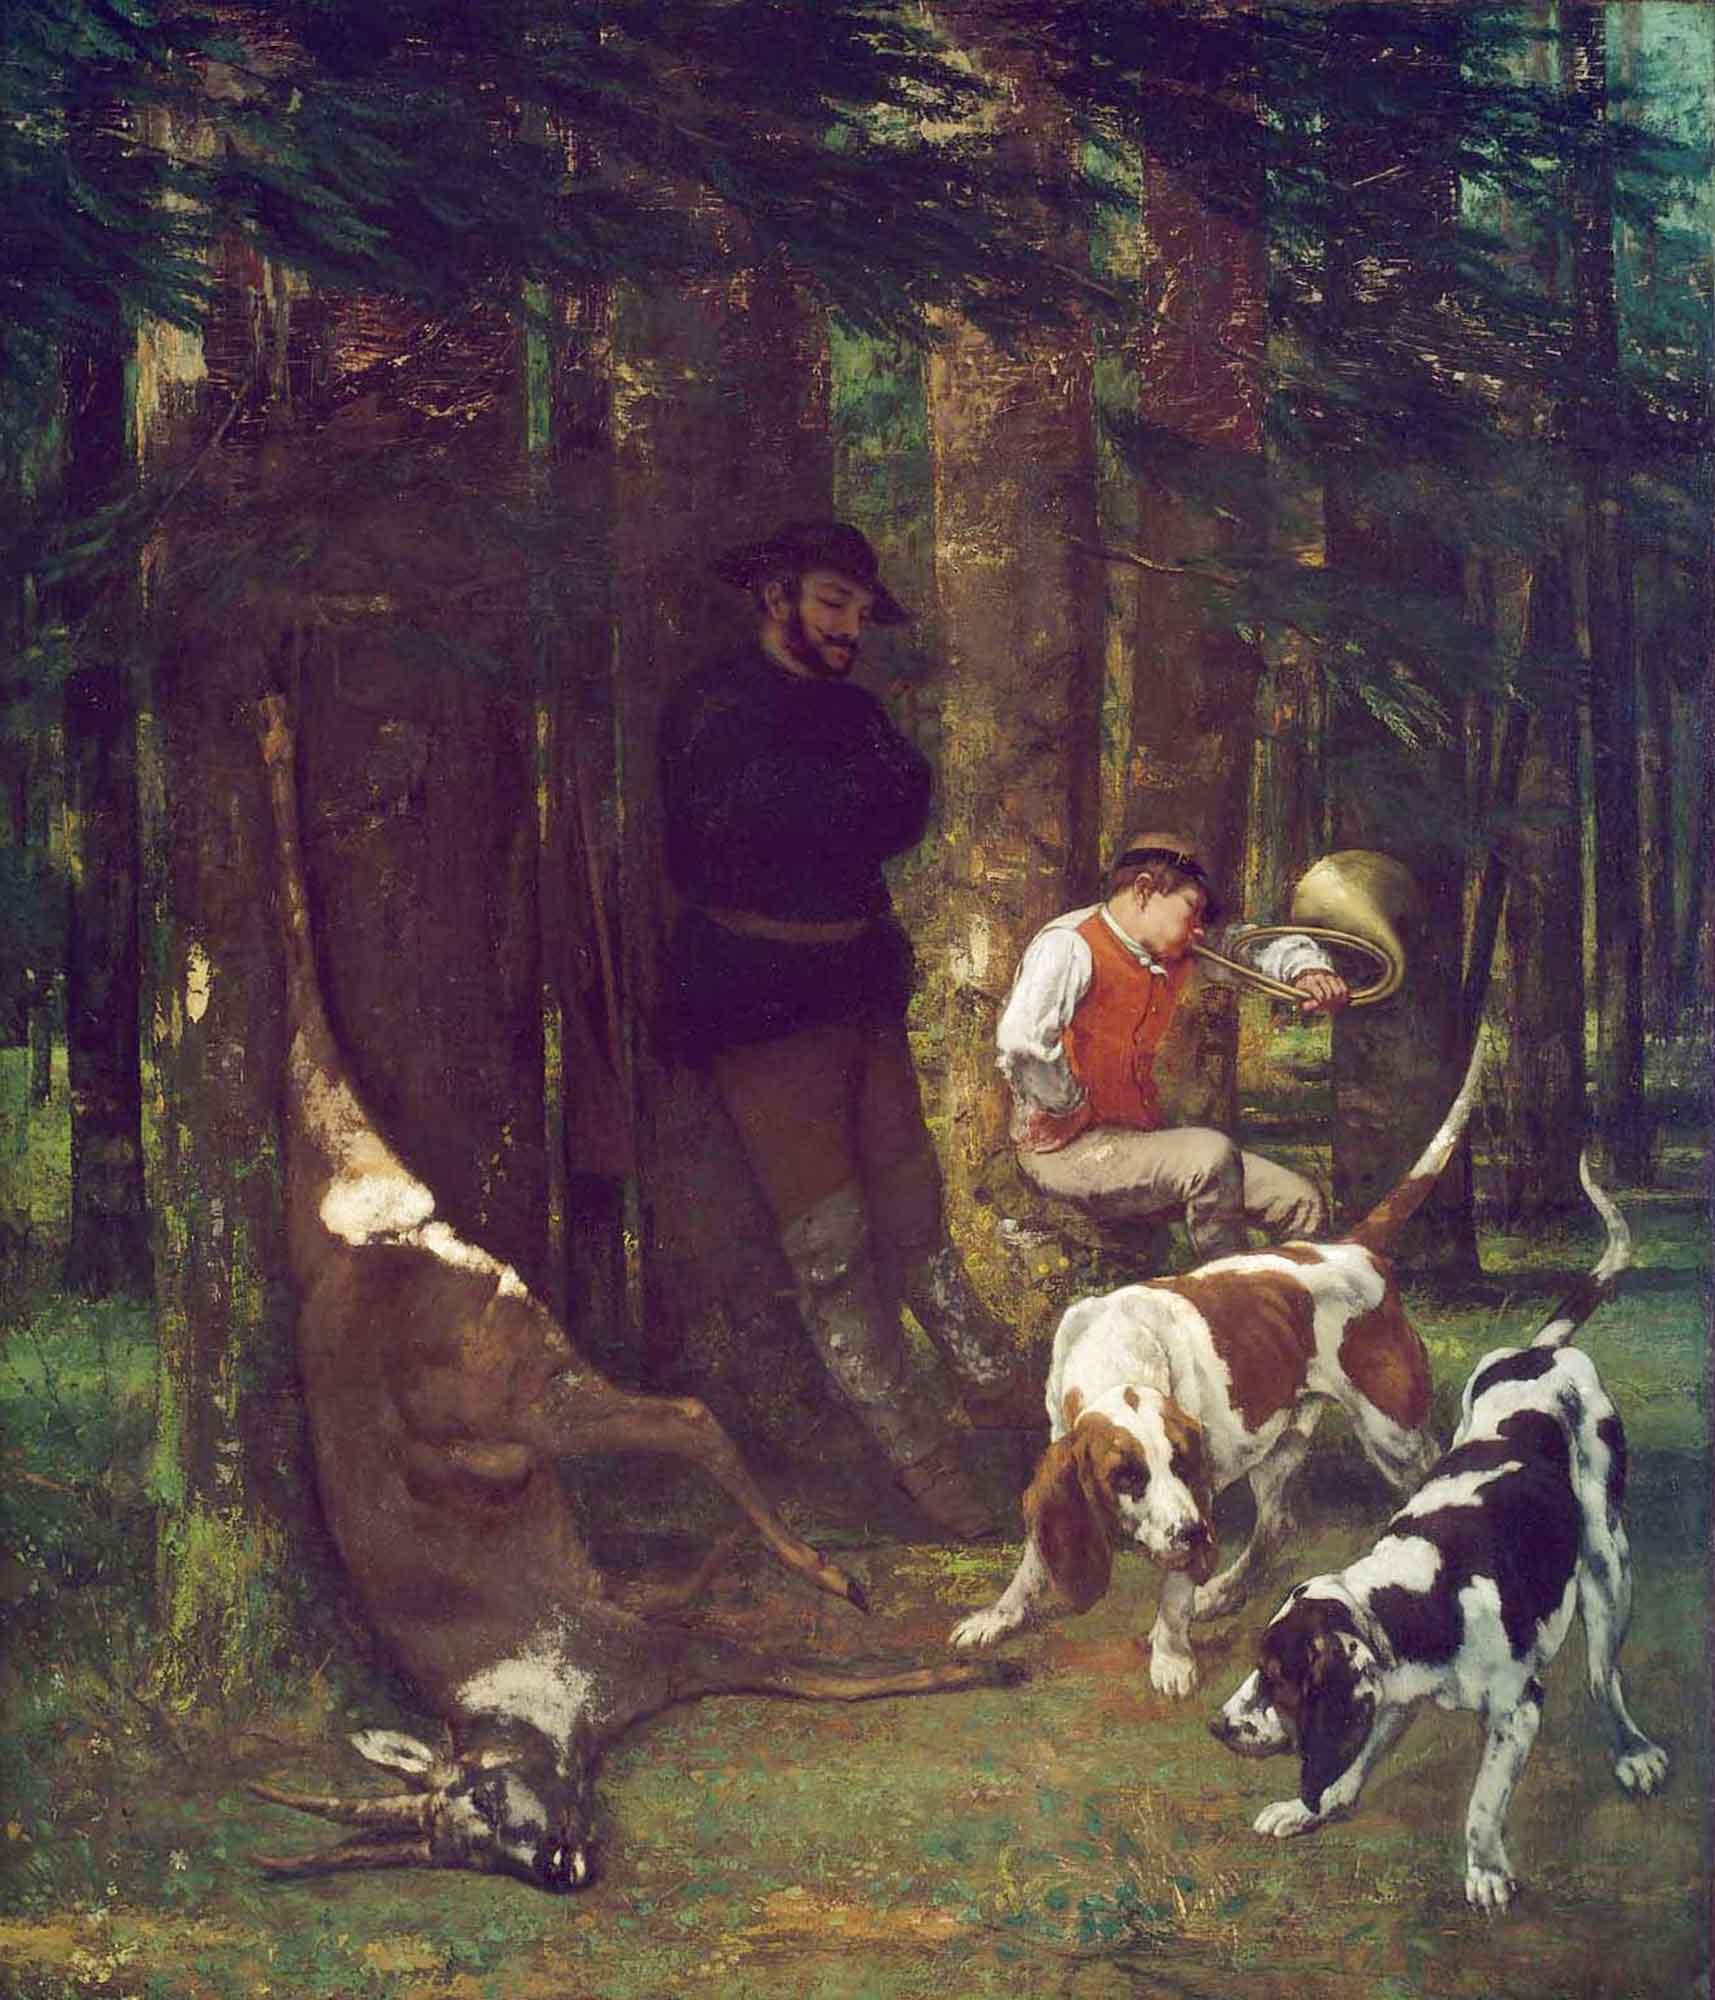 Gustave Courbet Avda Köpeklerle